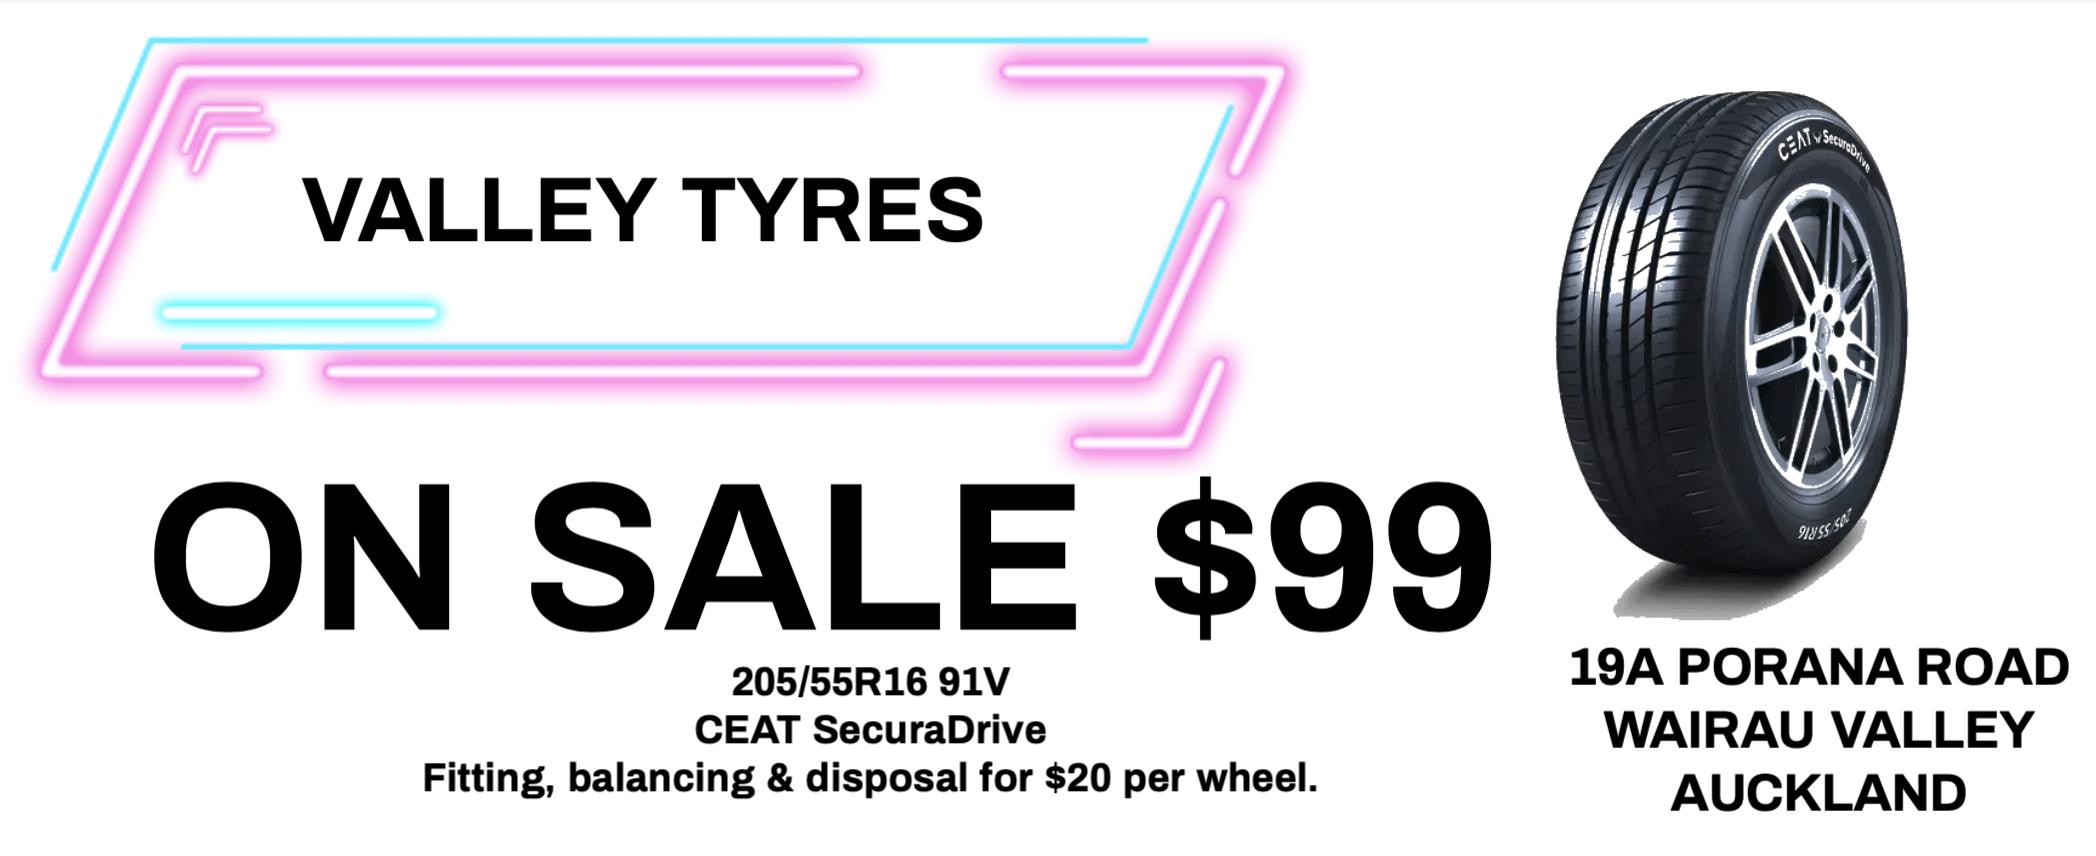 Alloy wheel - Car